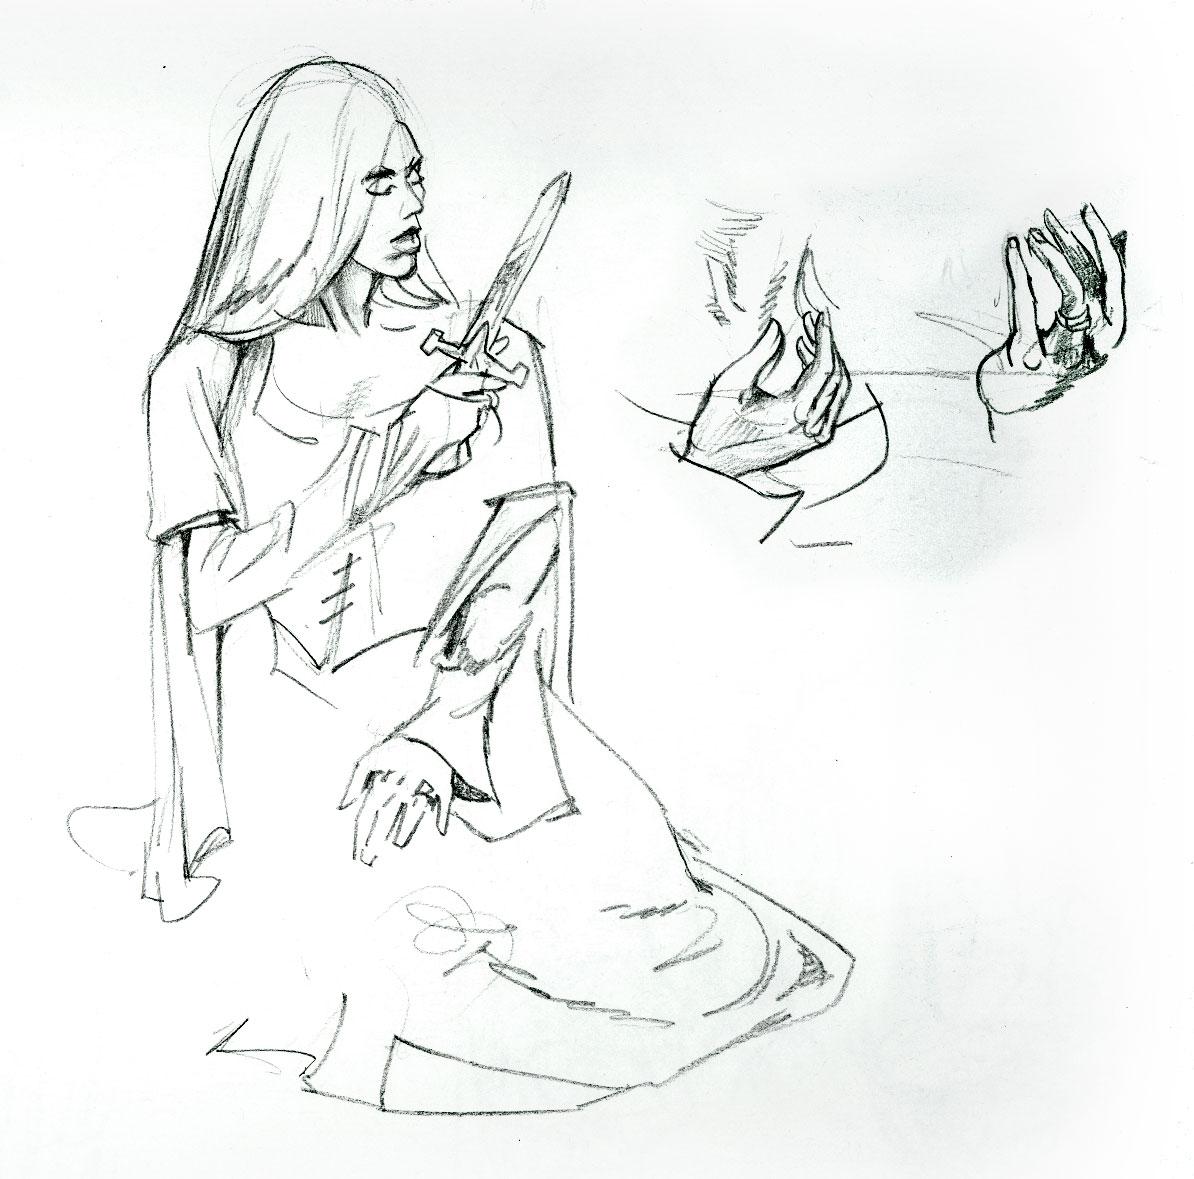 1194x1179 The Art Of Emery Miller Figure Drawing Renaissance Woman